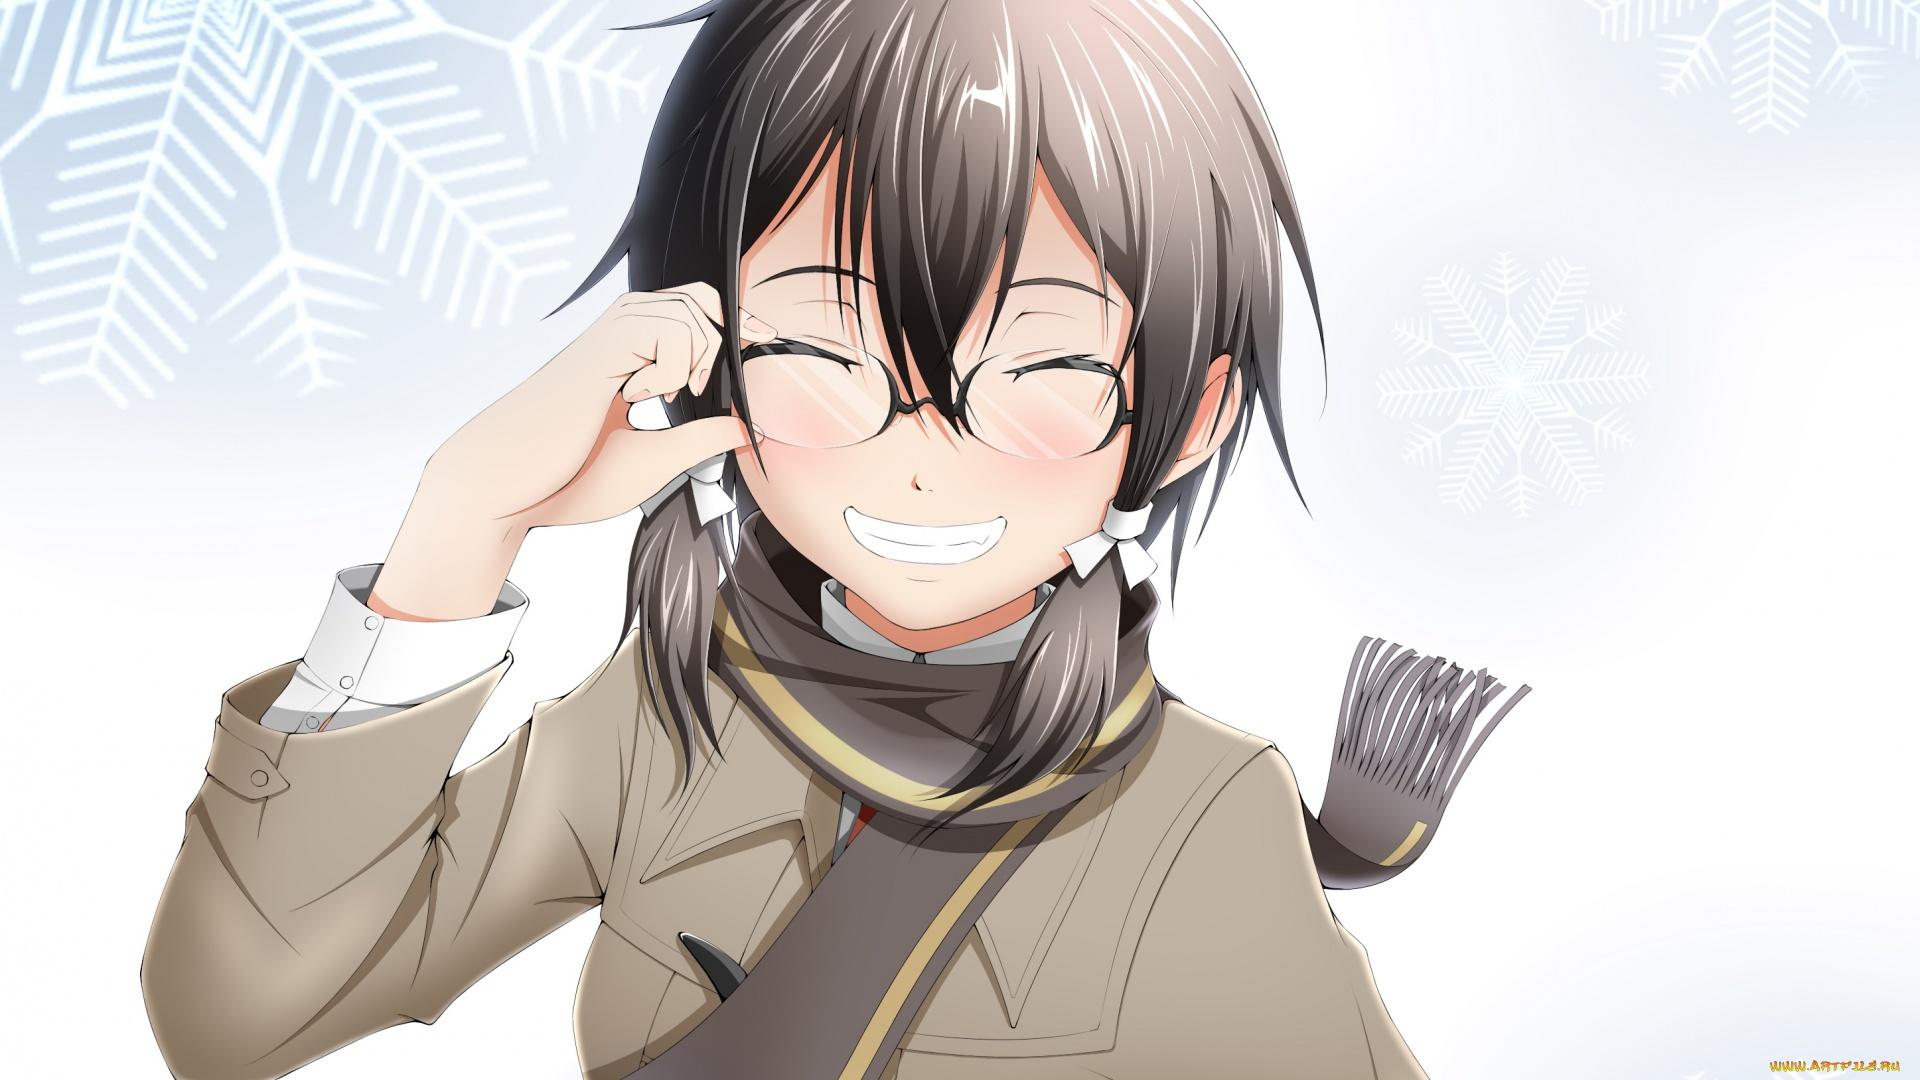 Anime Girl Smile hd background